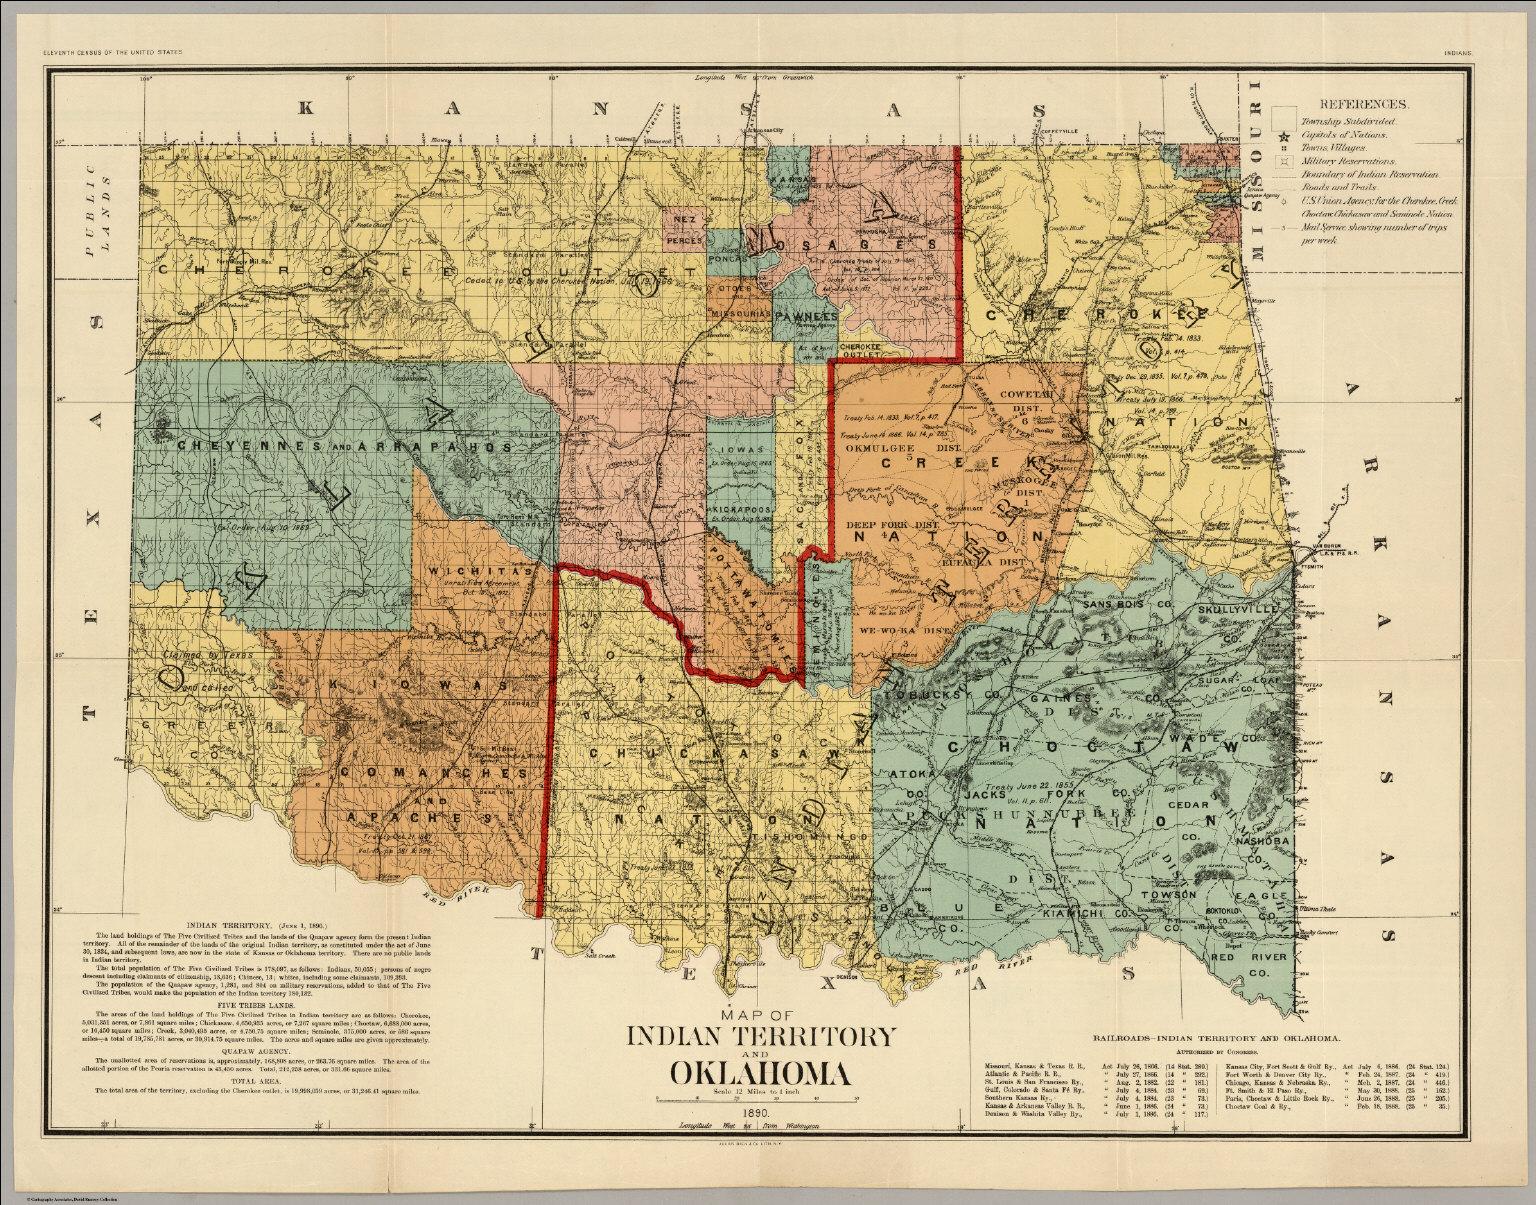 oklahoma-indian-territory1890-30.jpg